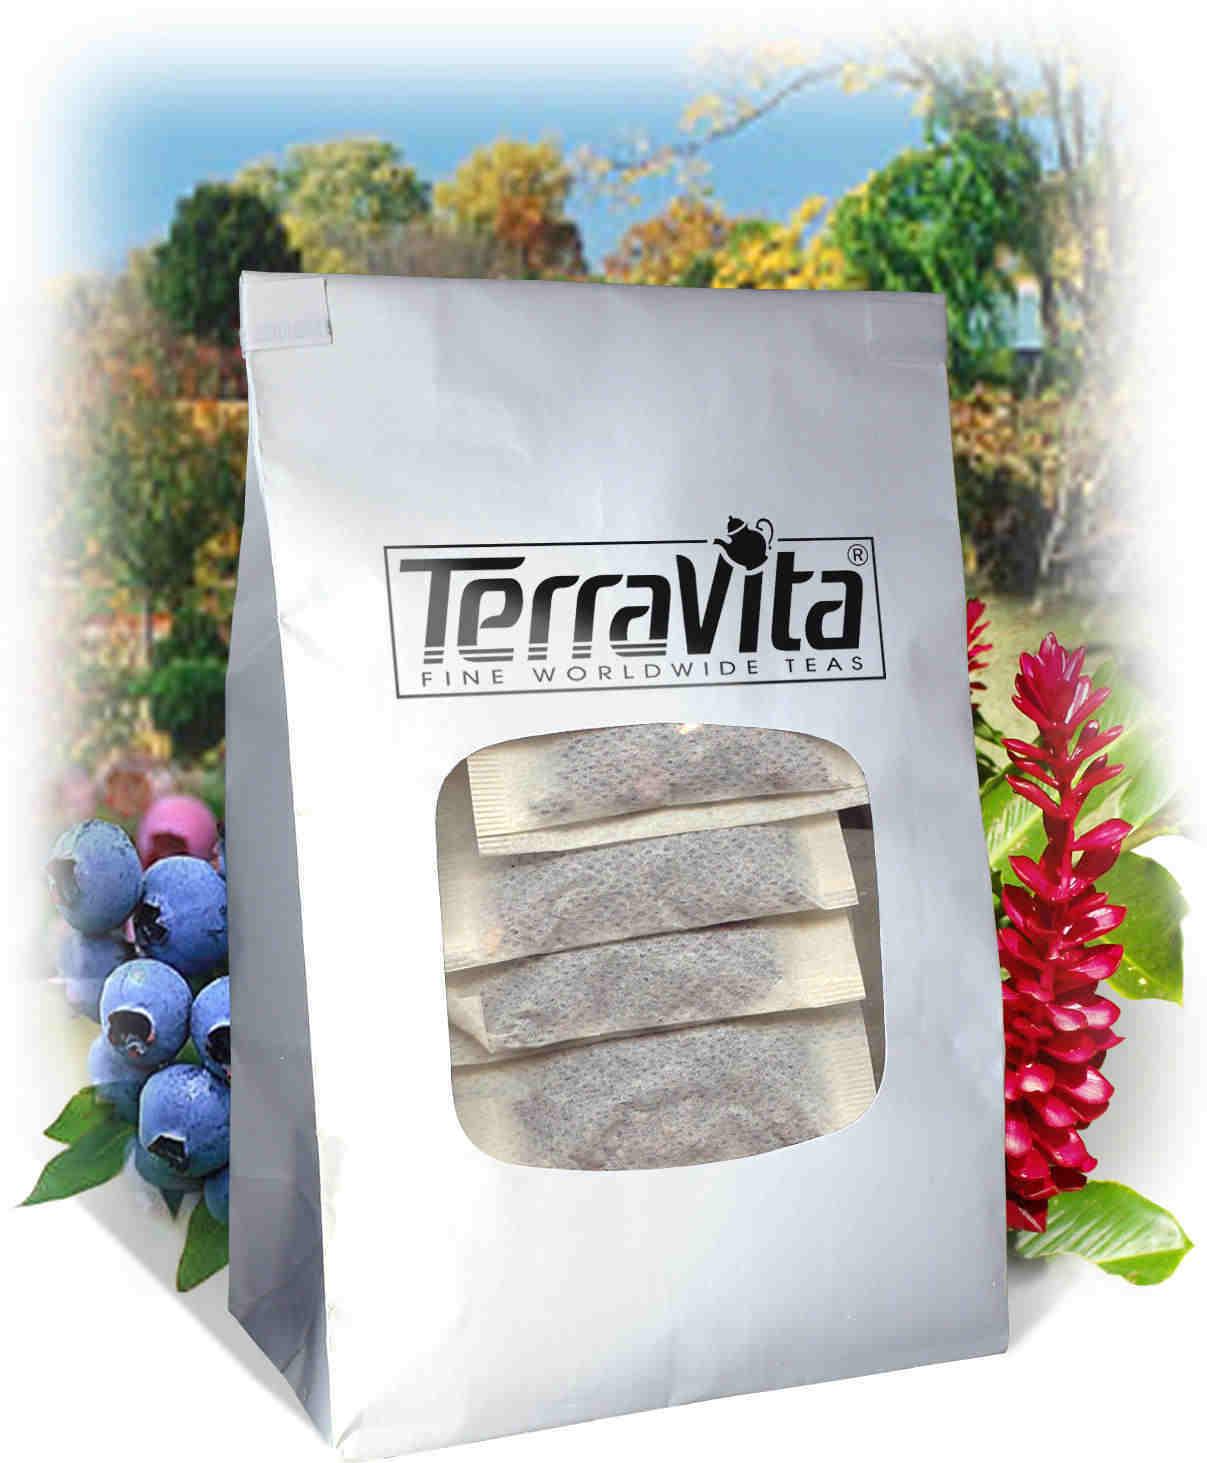 Red Raspberry Leaf (Certified Organic) Tea